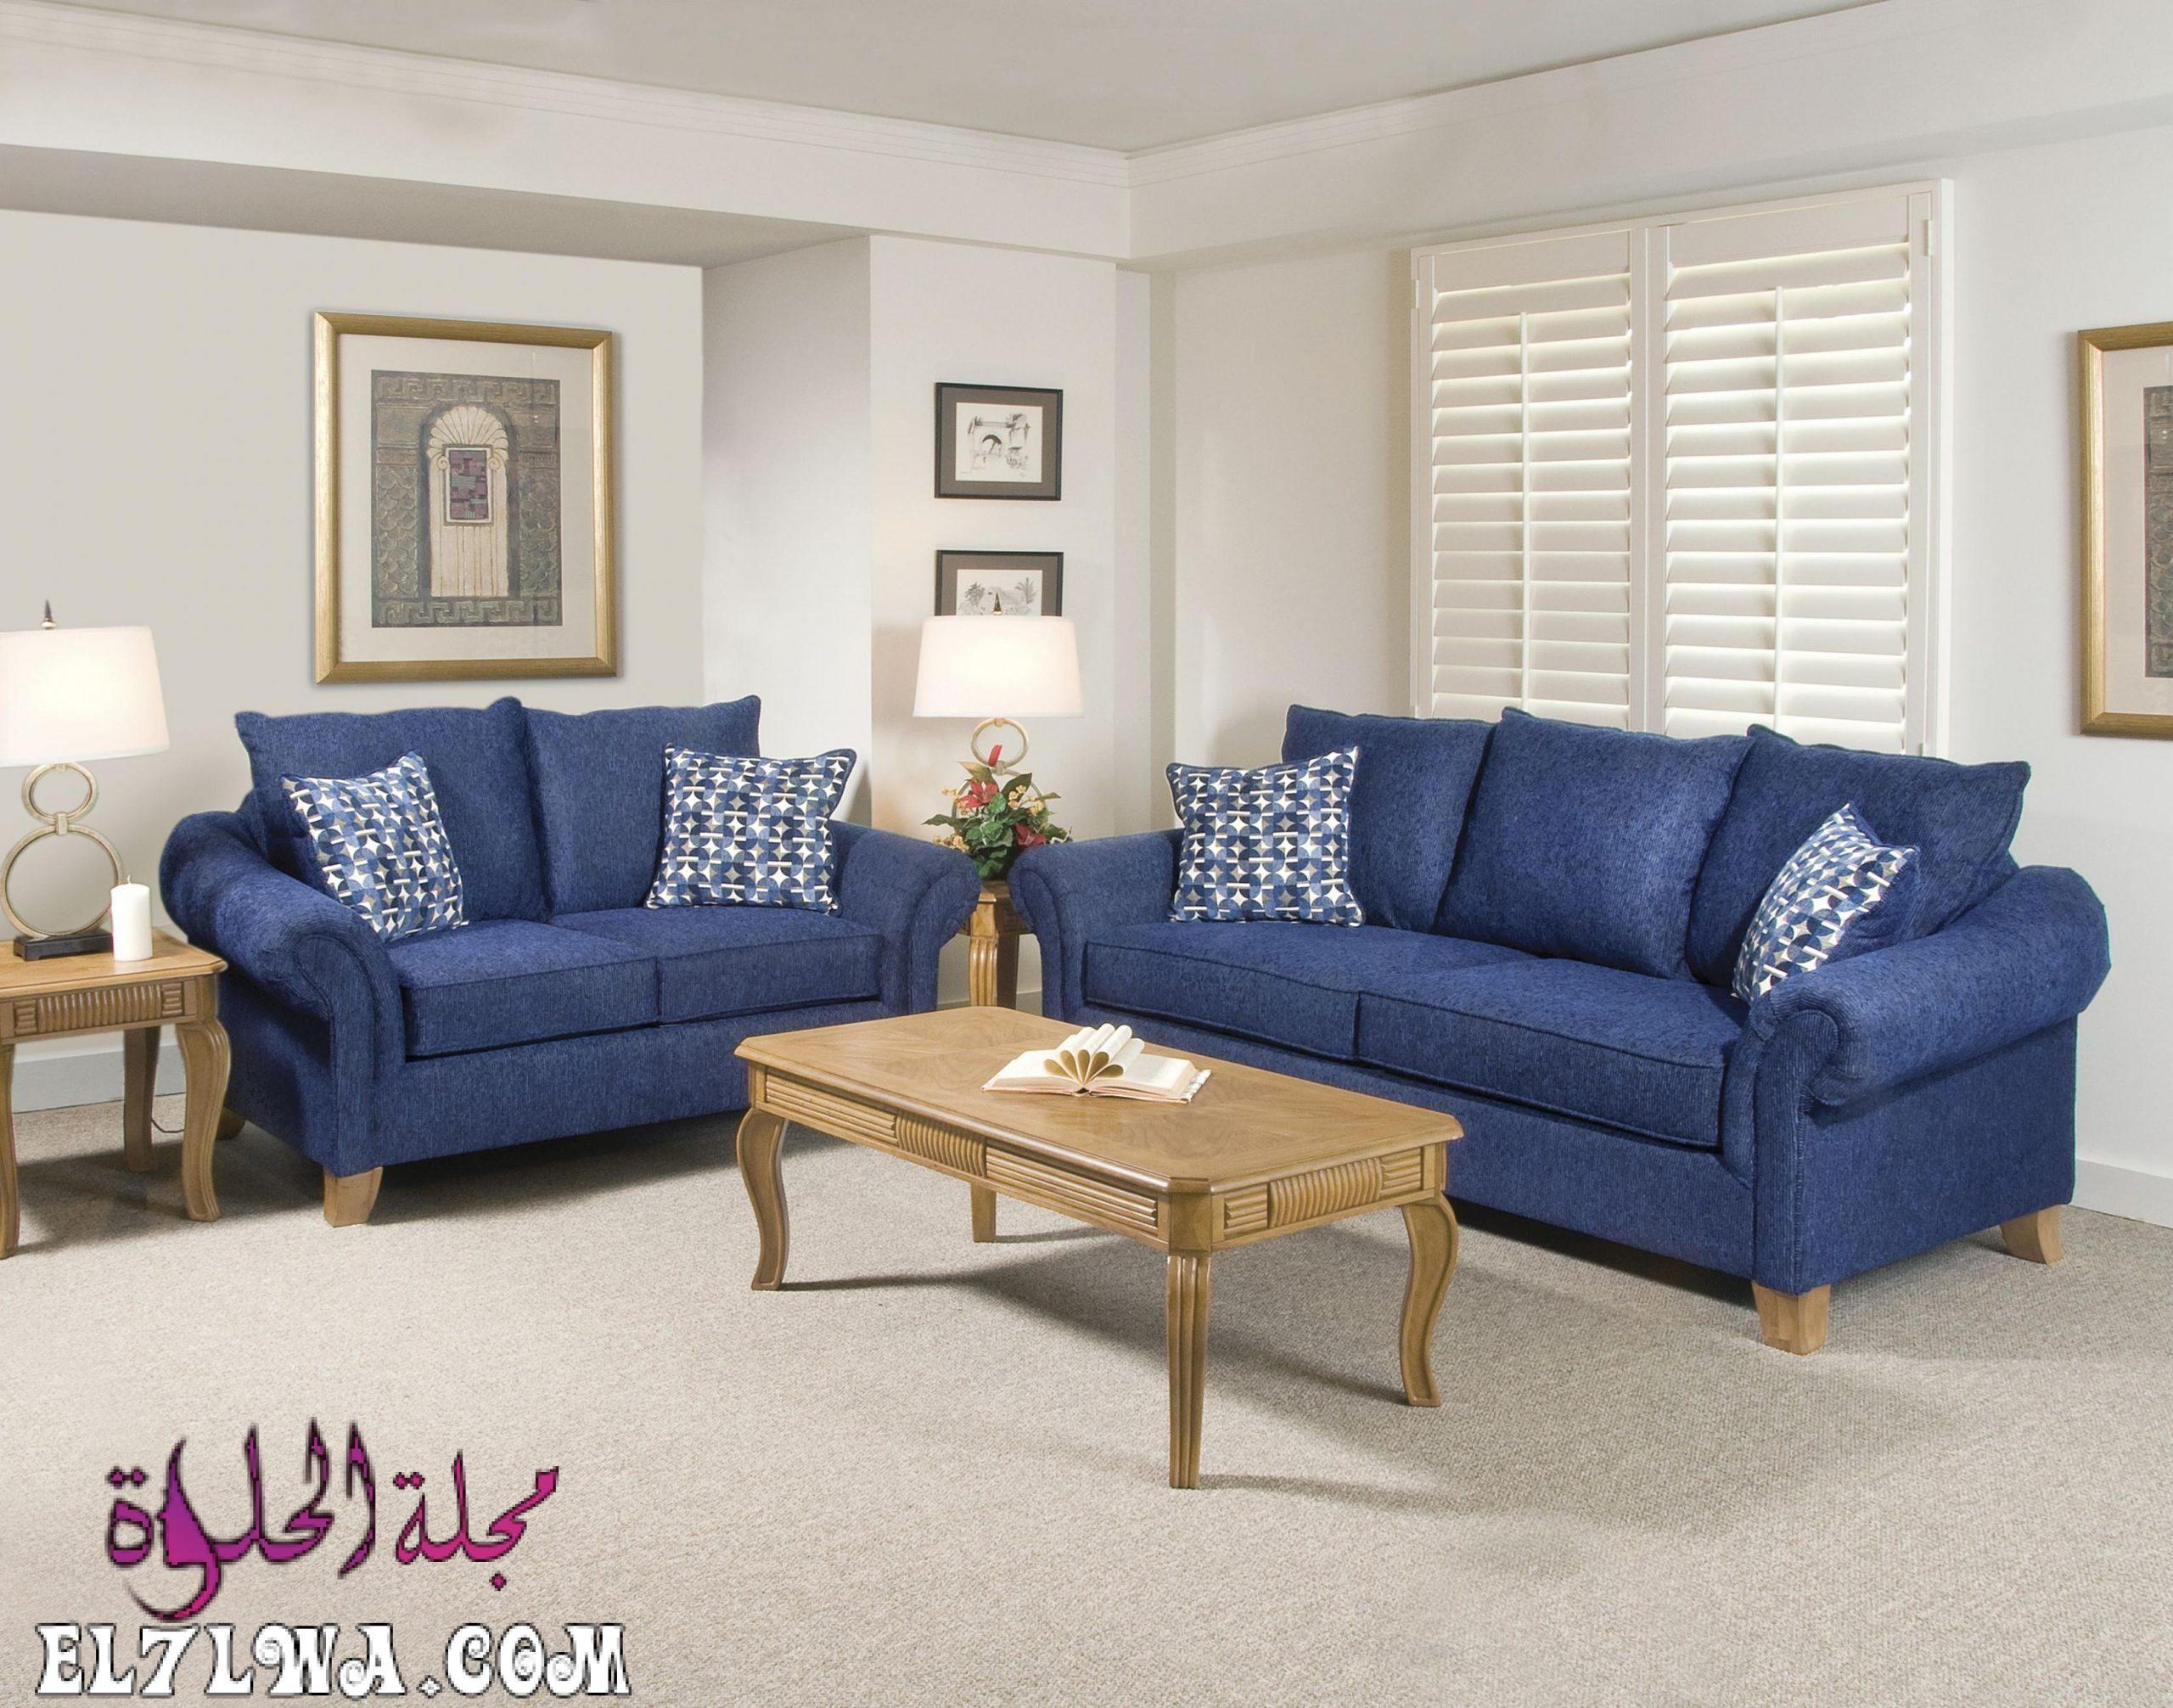 انتريهات مودرن 2021 صور انتريهات مودرن 2021 إن هناك العديد من الأذواق من الأنواع المودرن وهن Cheap Living Room Sets Blue Living Room Decor Living Room Leather